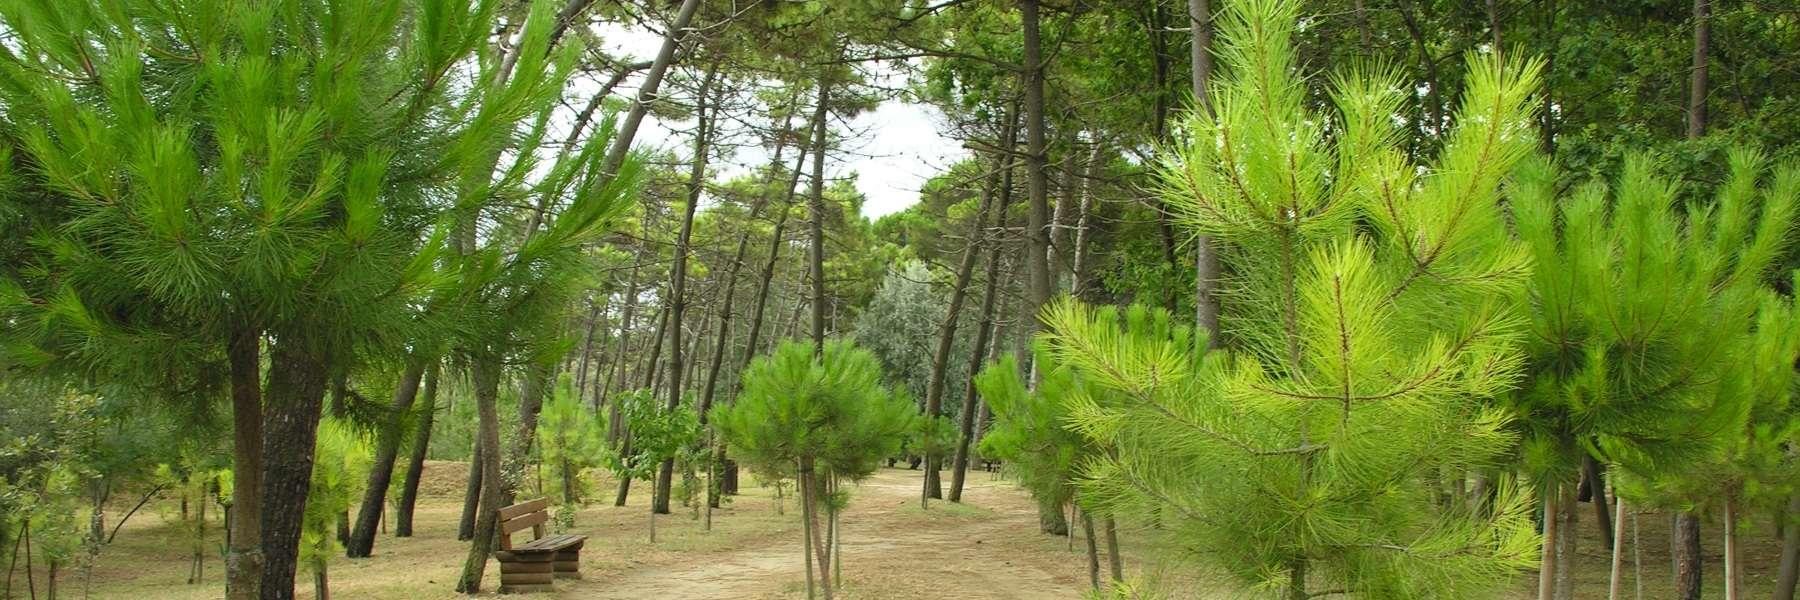 The Pinewood of Pinarella and Tagliata